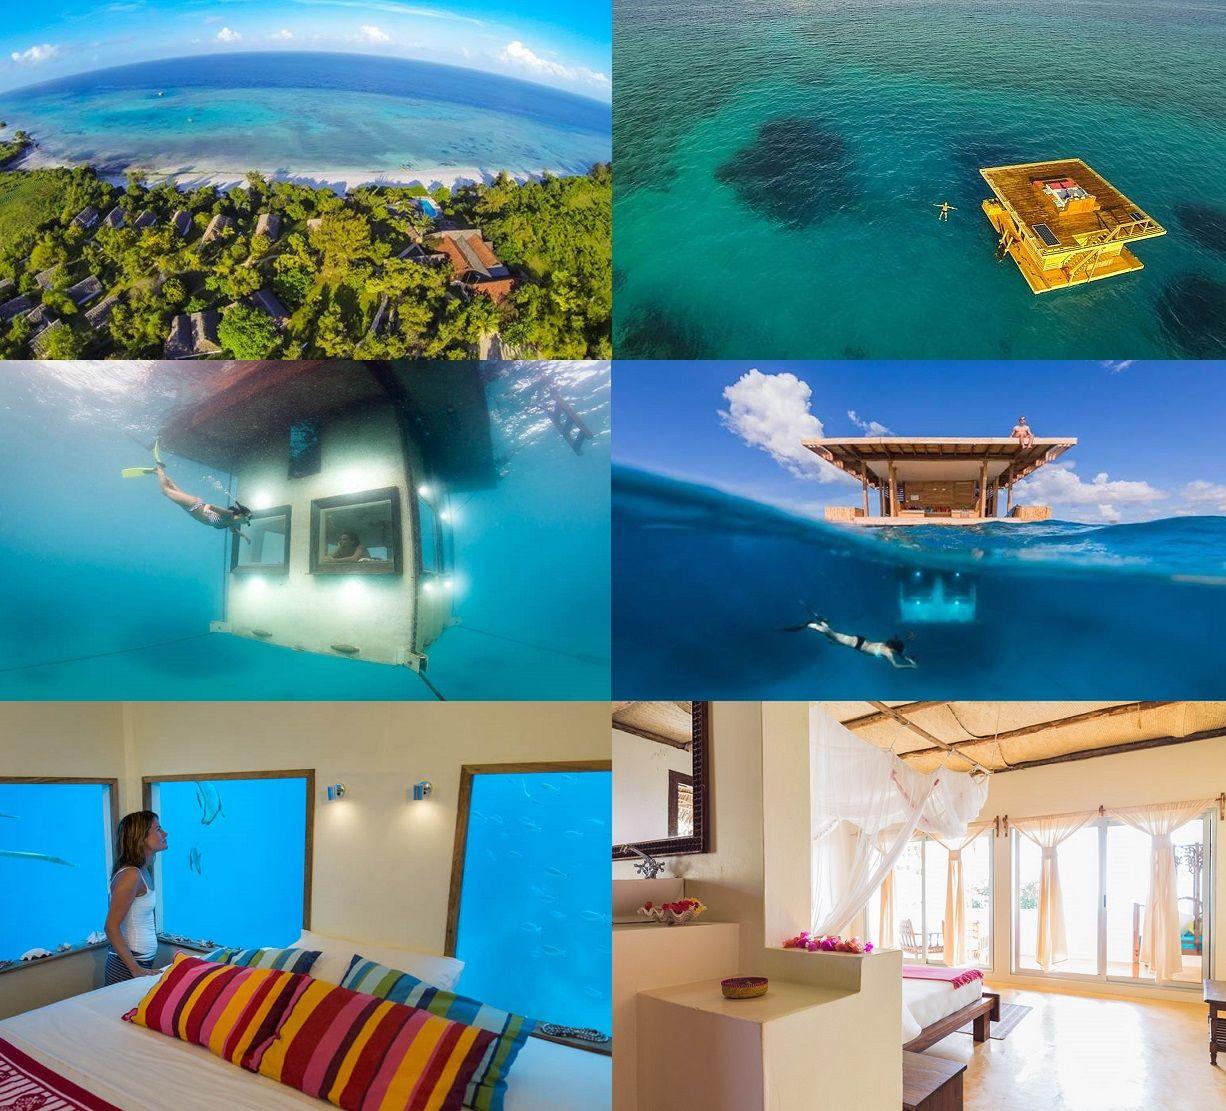 I Think This Is A Worthy Project To Build. : ) The Manta Resort, Pemba  Island, Zanzibar